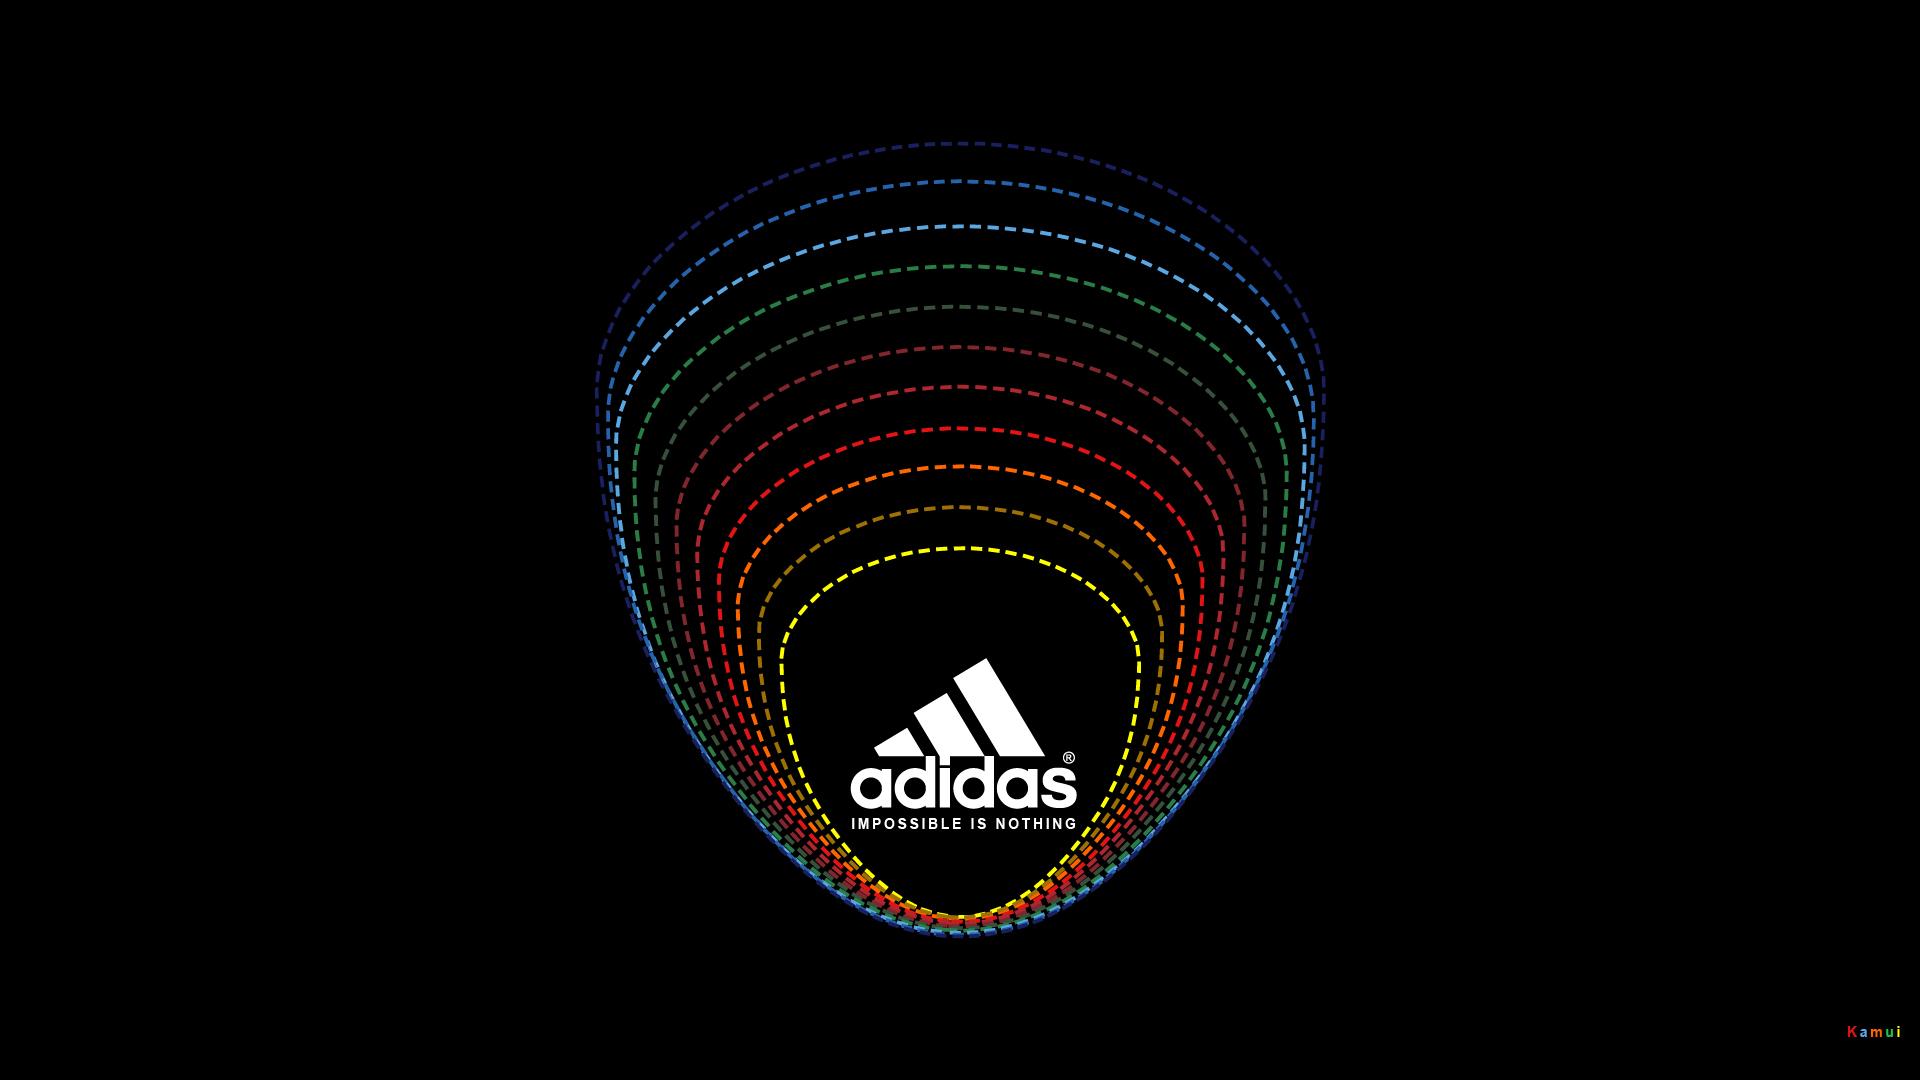 Wallpaper Logo Adidas Full Hd Visiteurope Uat